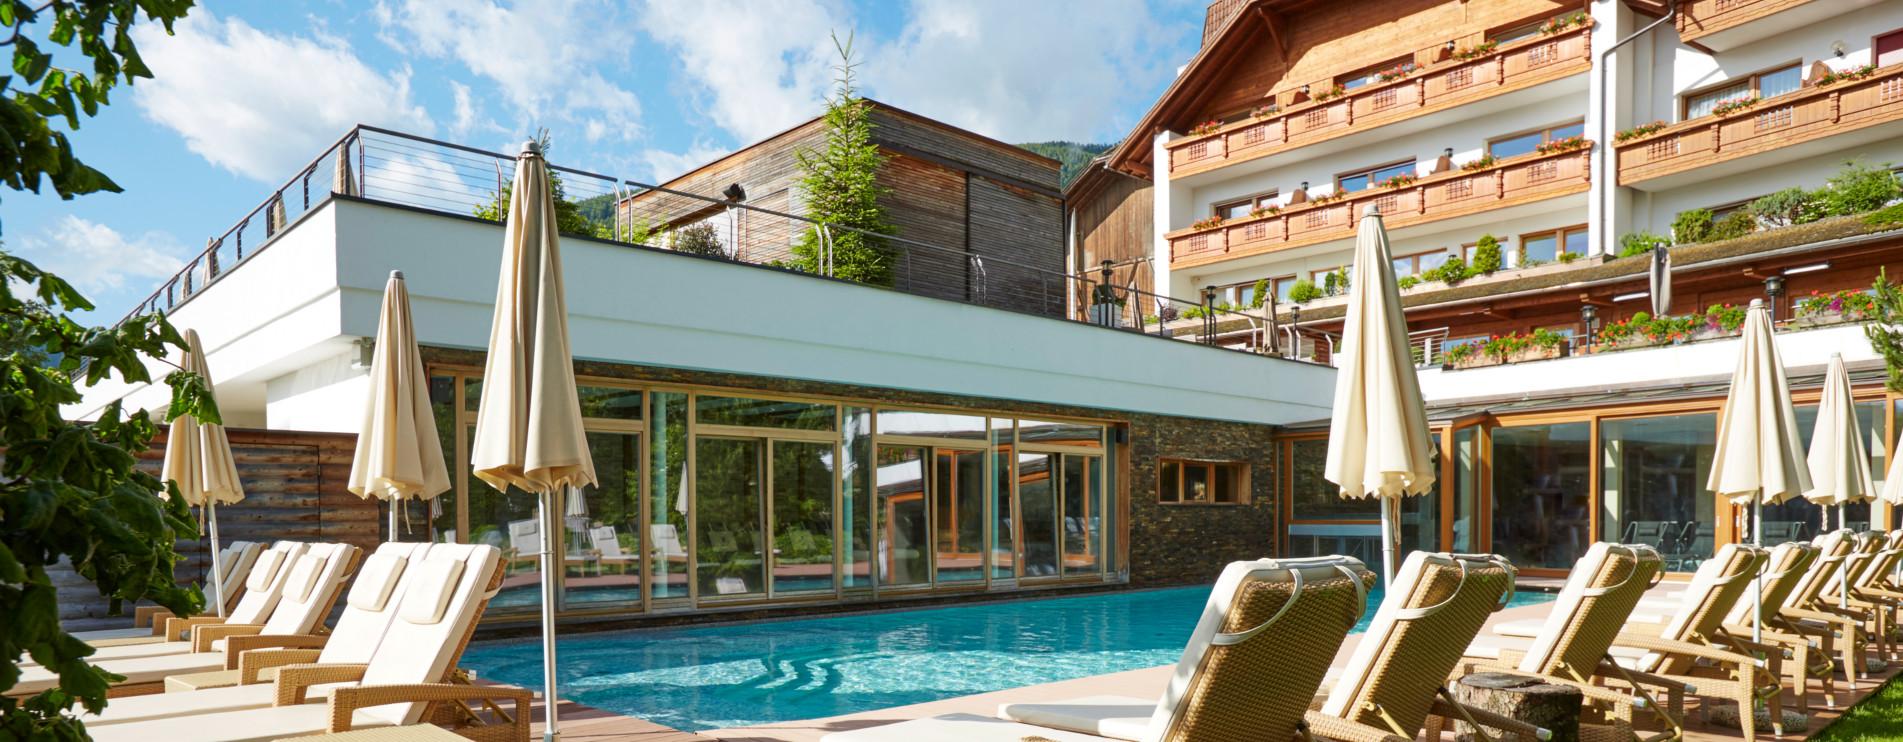 Sporthotel Winkler, Hotel Benessere in Trentino Alto Adige Lanerhof